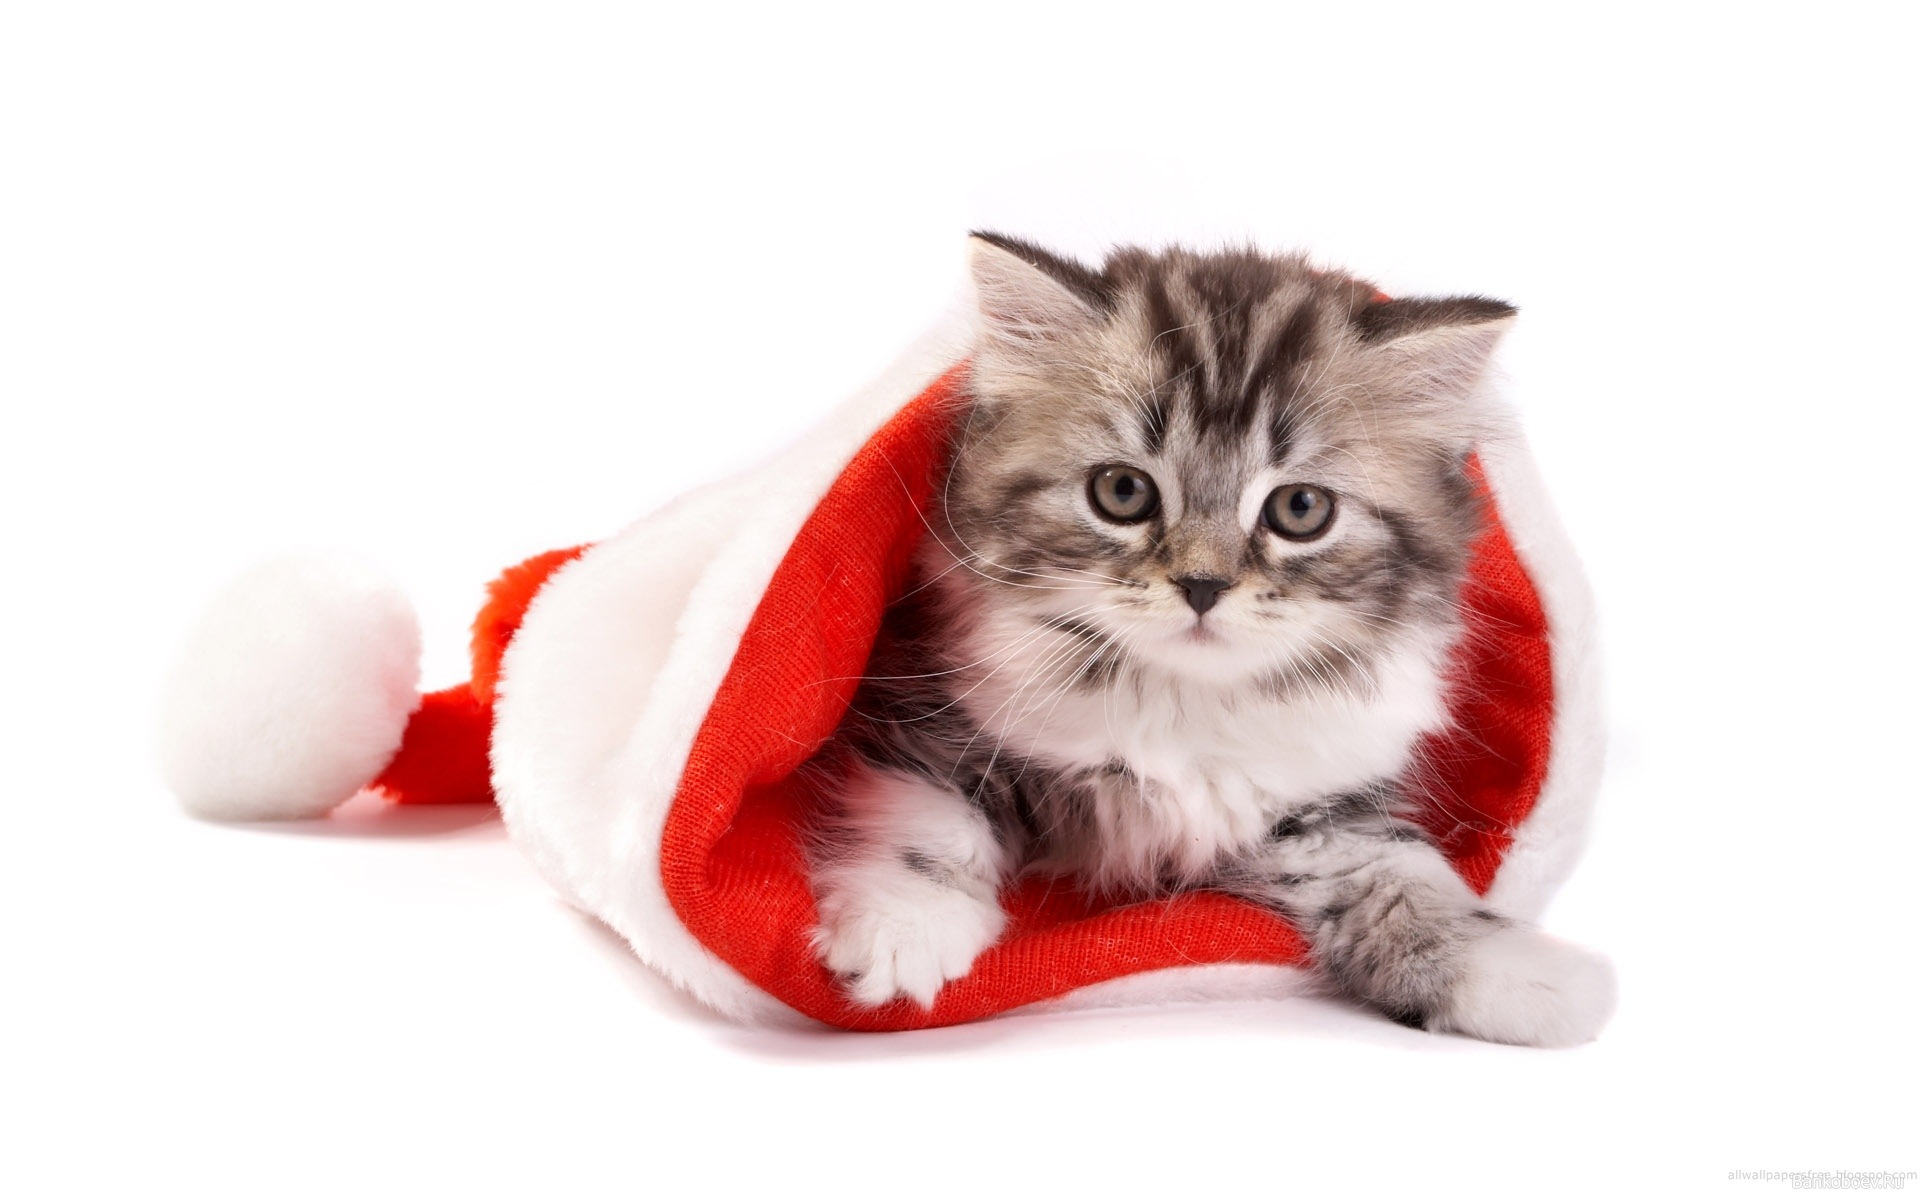 котенок дед мороз, скачать обои на рабочий стол, kitten Santa Claus wallpaper, фото